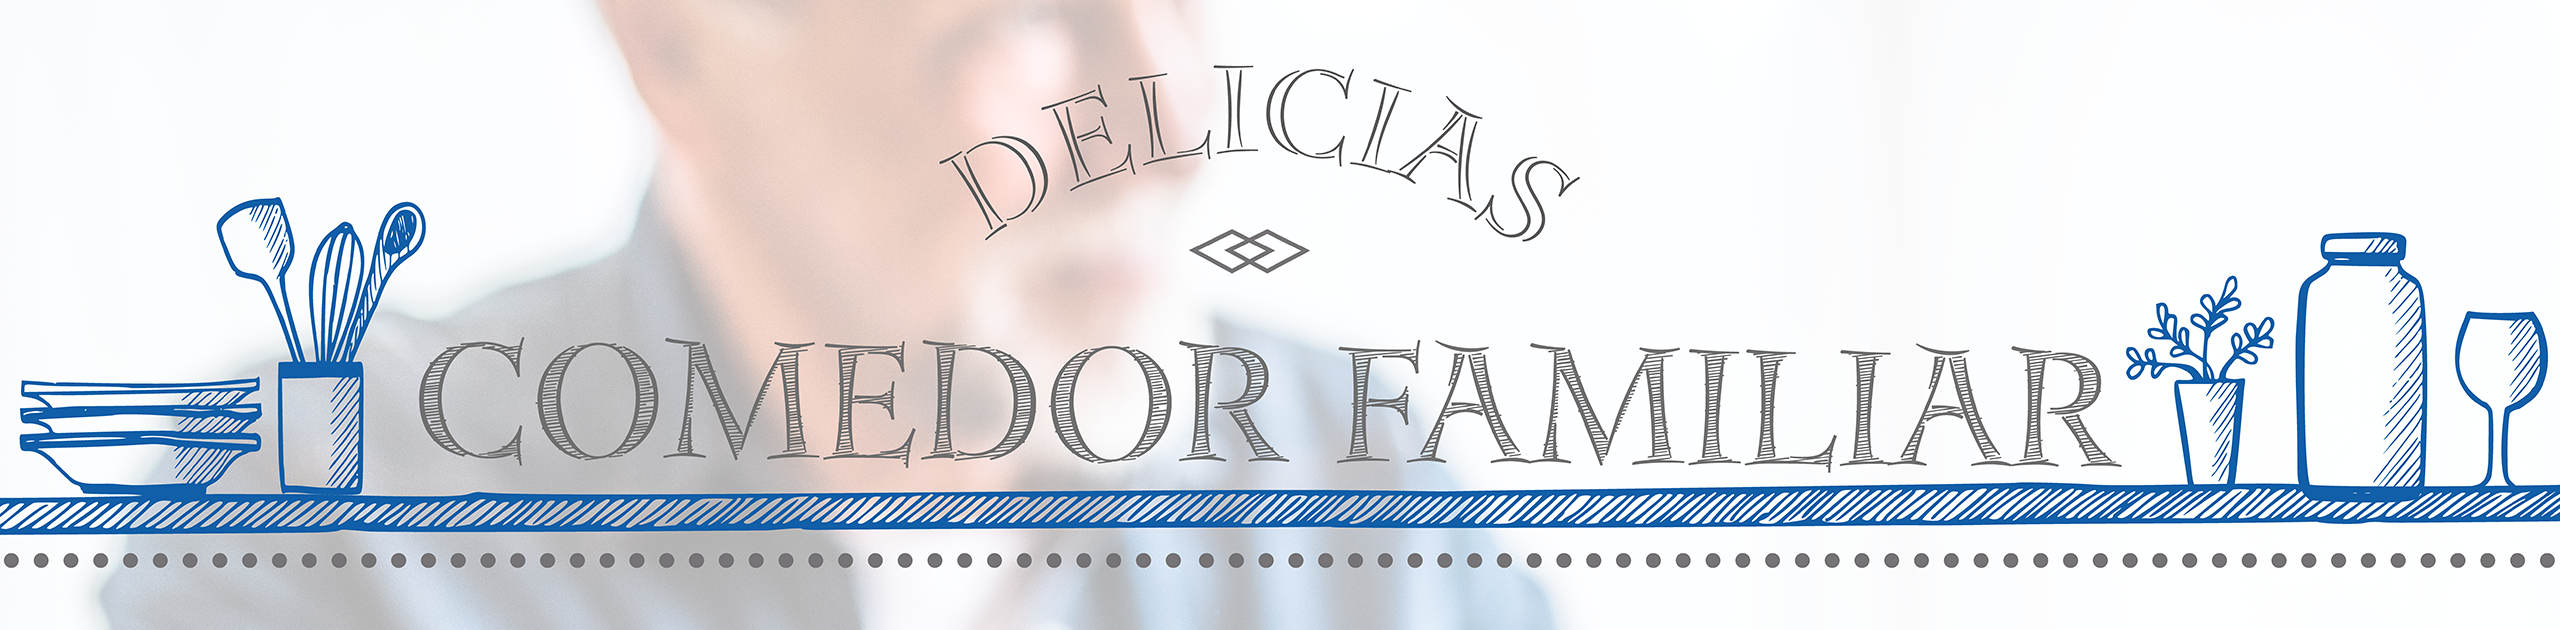 Comedor Familiar Zaragoza ¡Ayúdanos!